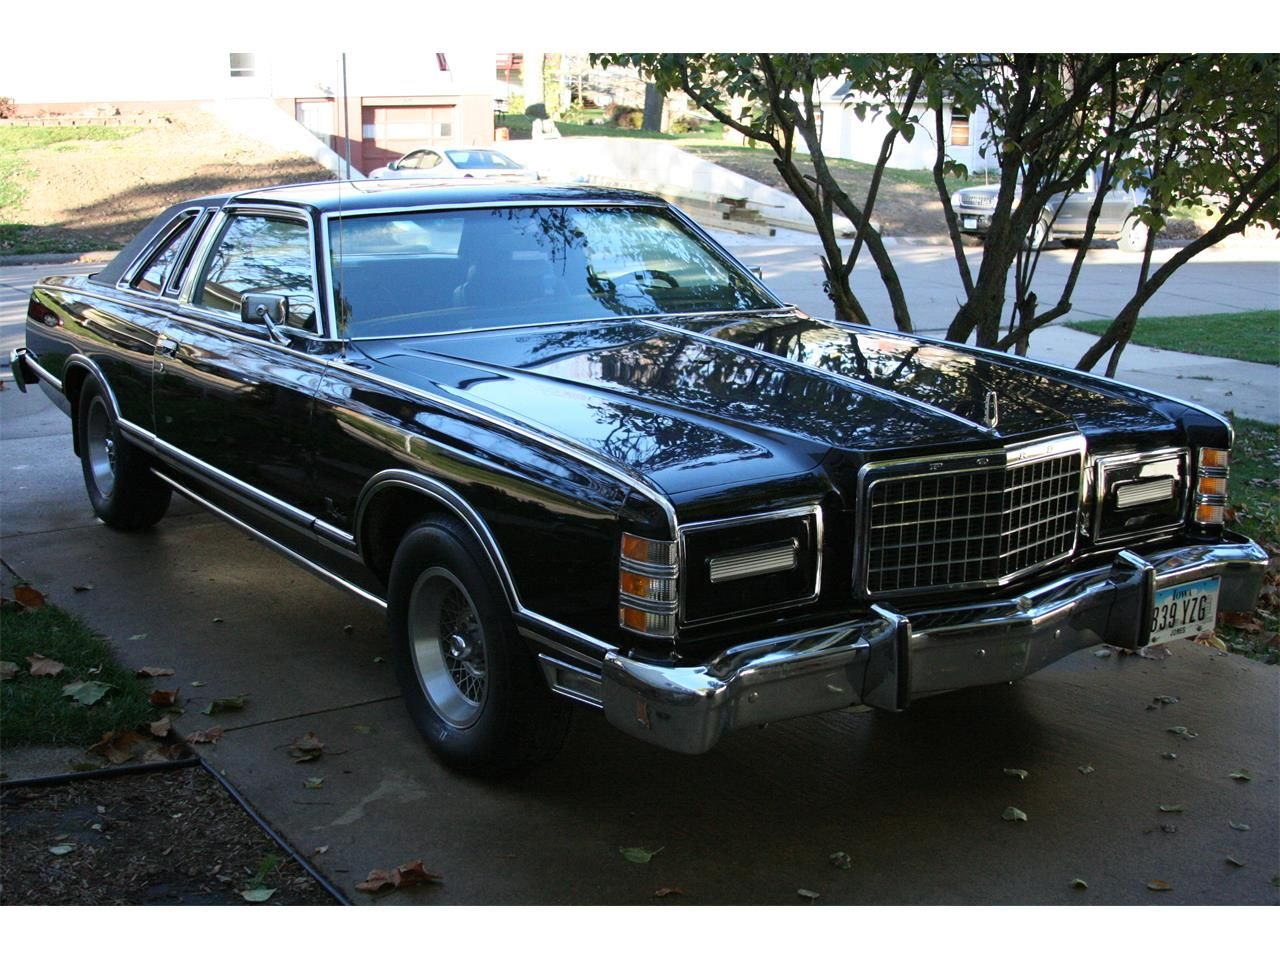 1976 Ford LTD for Sale | ClassicCars.com | CC-636449 | Ford T-Bird ...